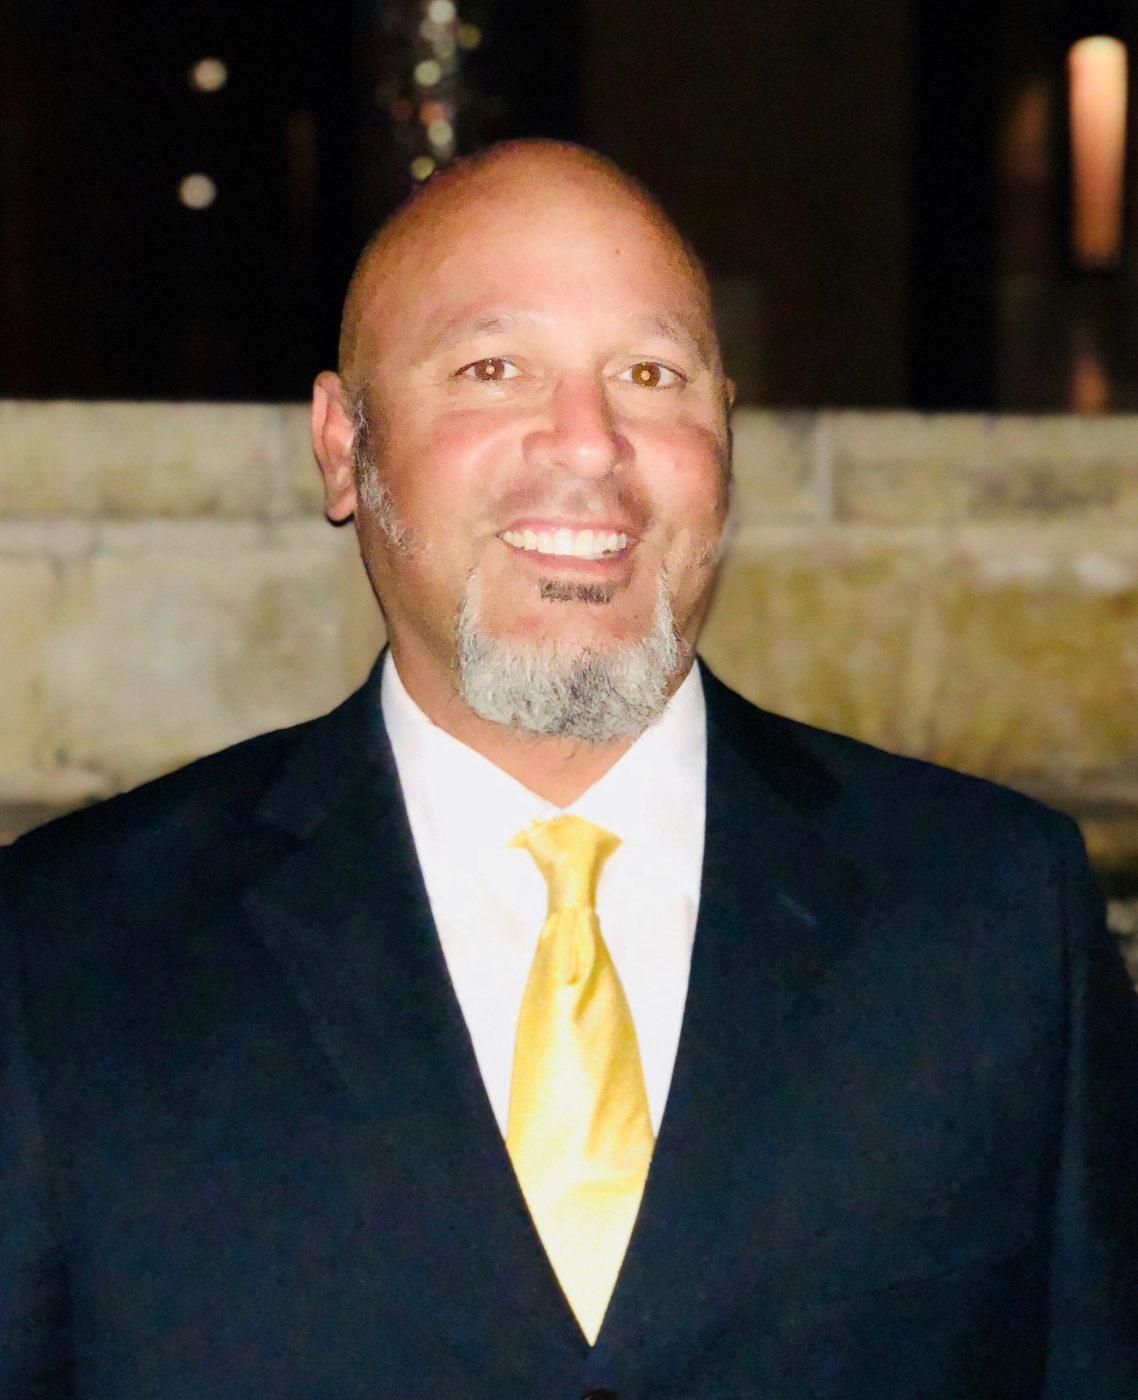 Reverend Joseph Devlin with Texas Wedding Ministers